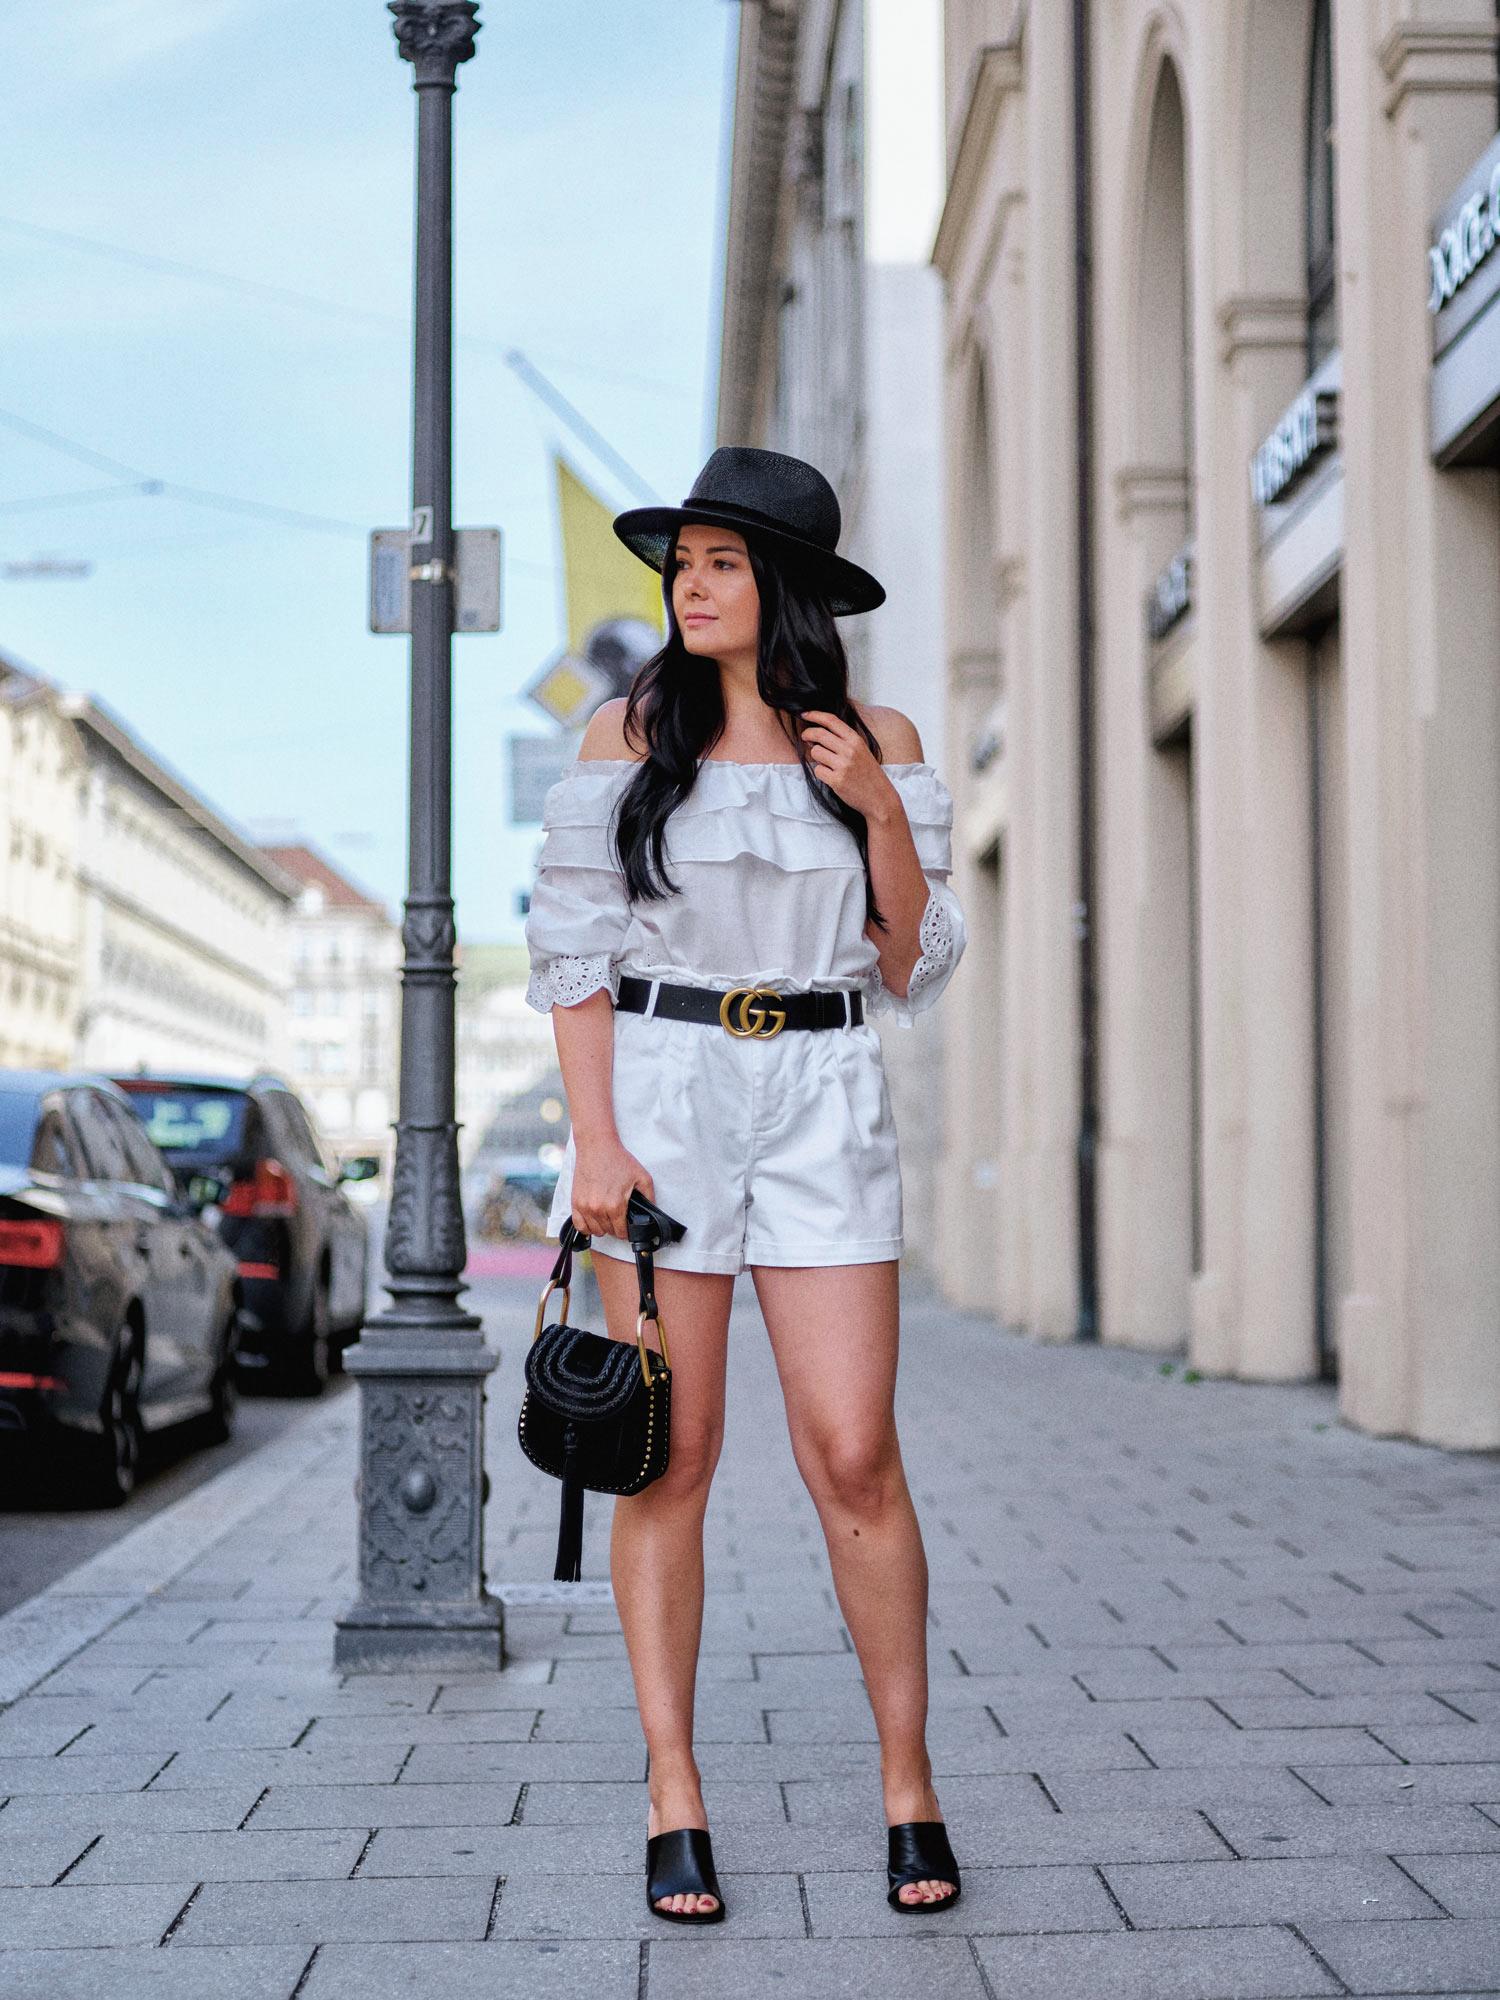 fashion-blogger-aus-muenchen-fashionblogger-lifestyleblogger-beautyblogger-fashion-blogger-modeblogger-modeblog-munich-blog-muenchen-offshoulder-bluse